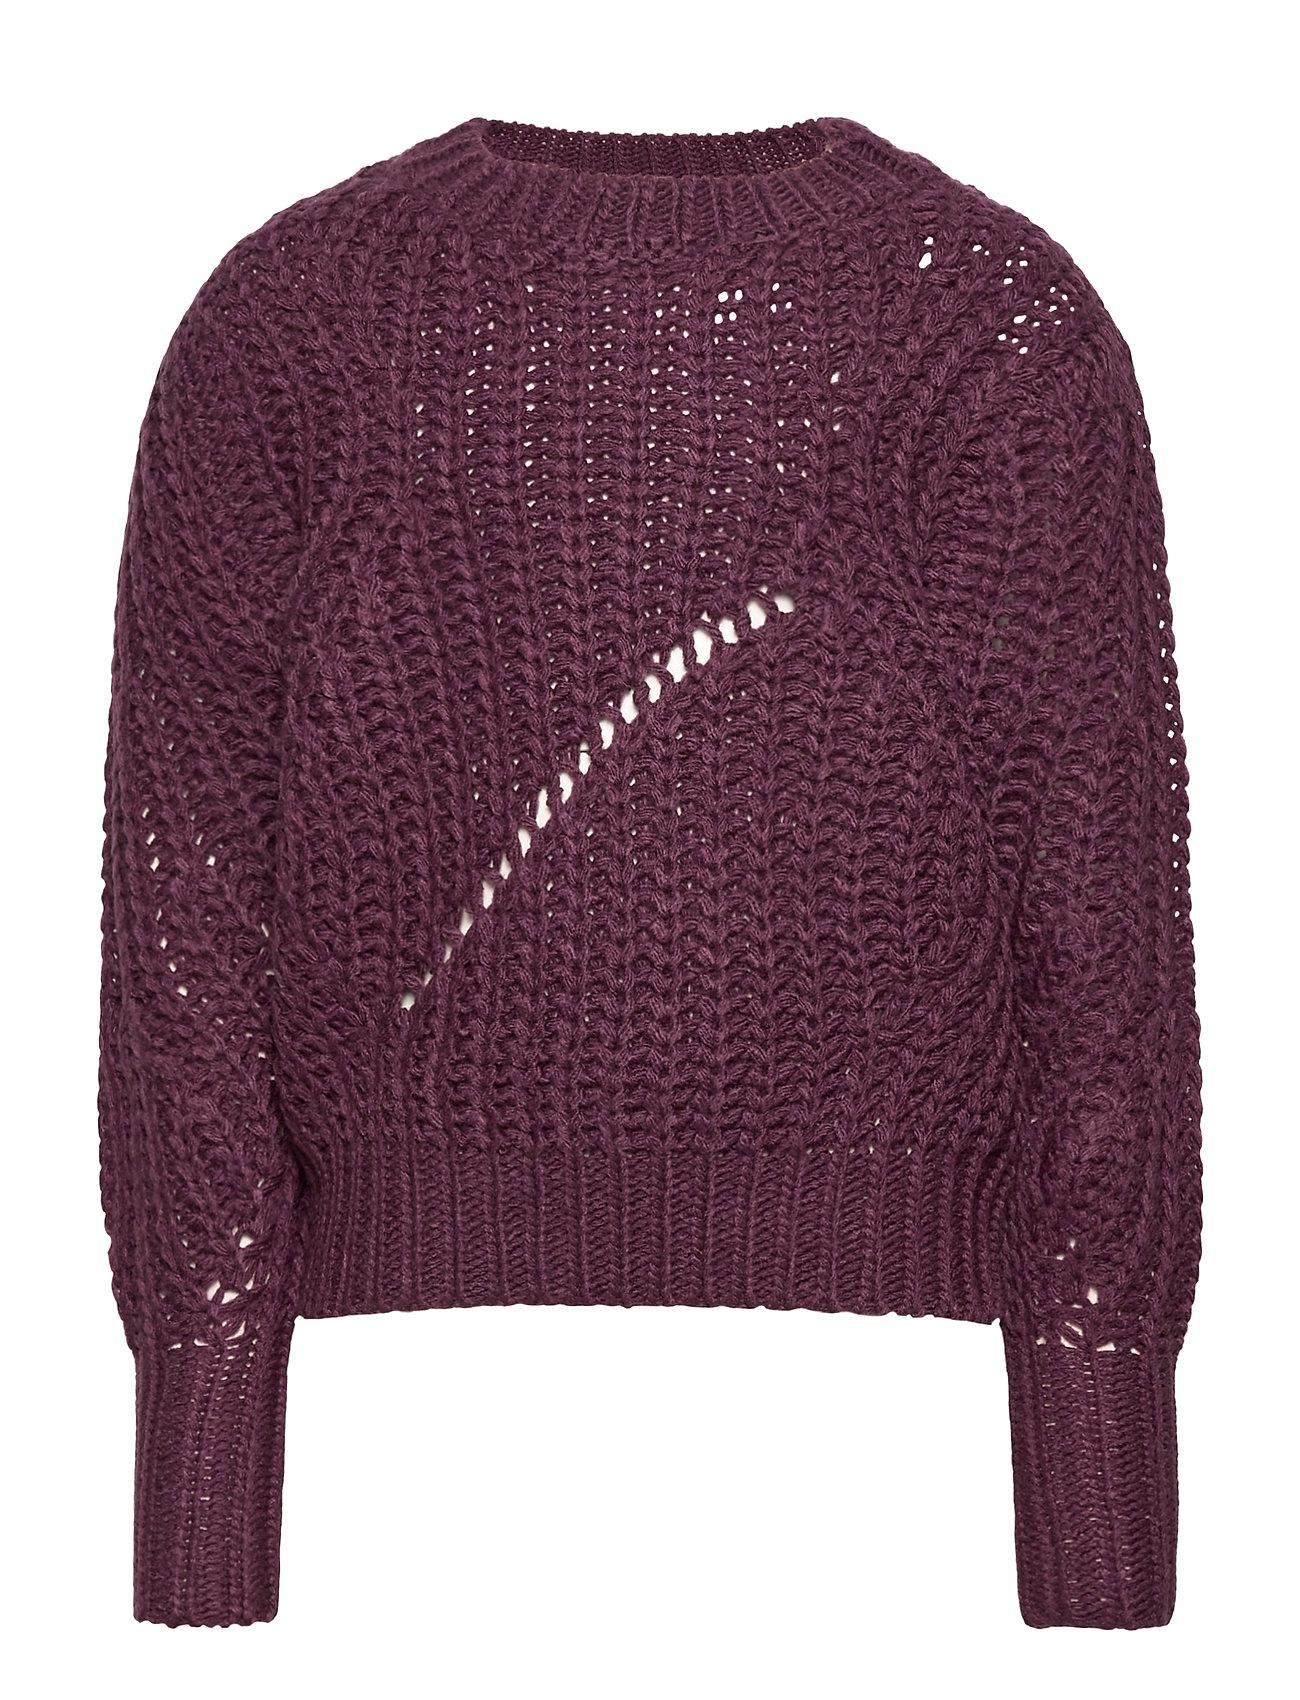 Image of Sharon Knit Pullover Pullover Striktrøje Lilla The New (3474793625)